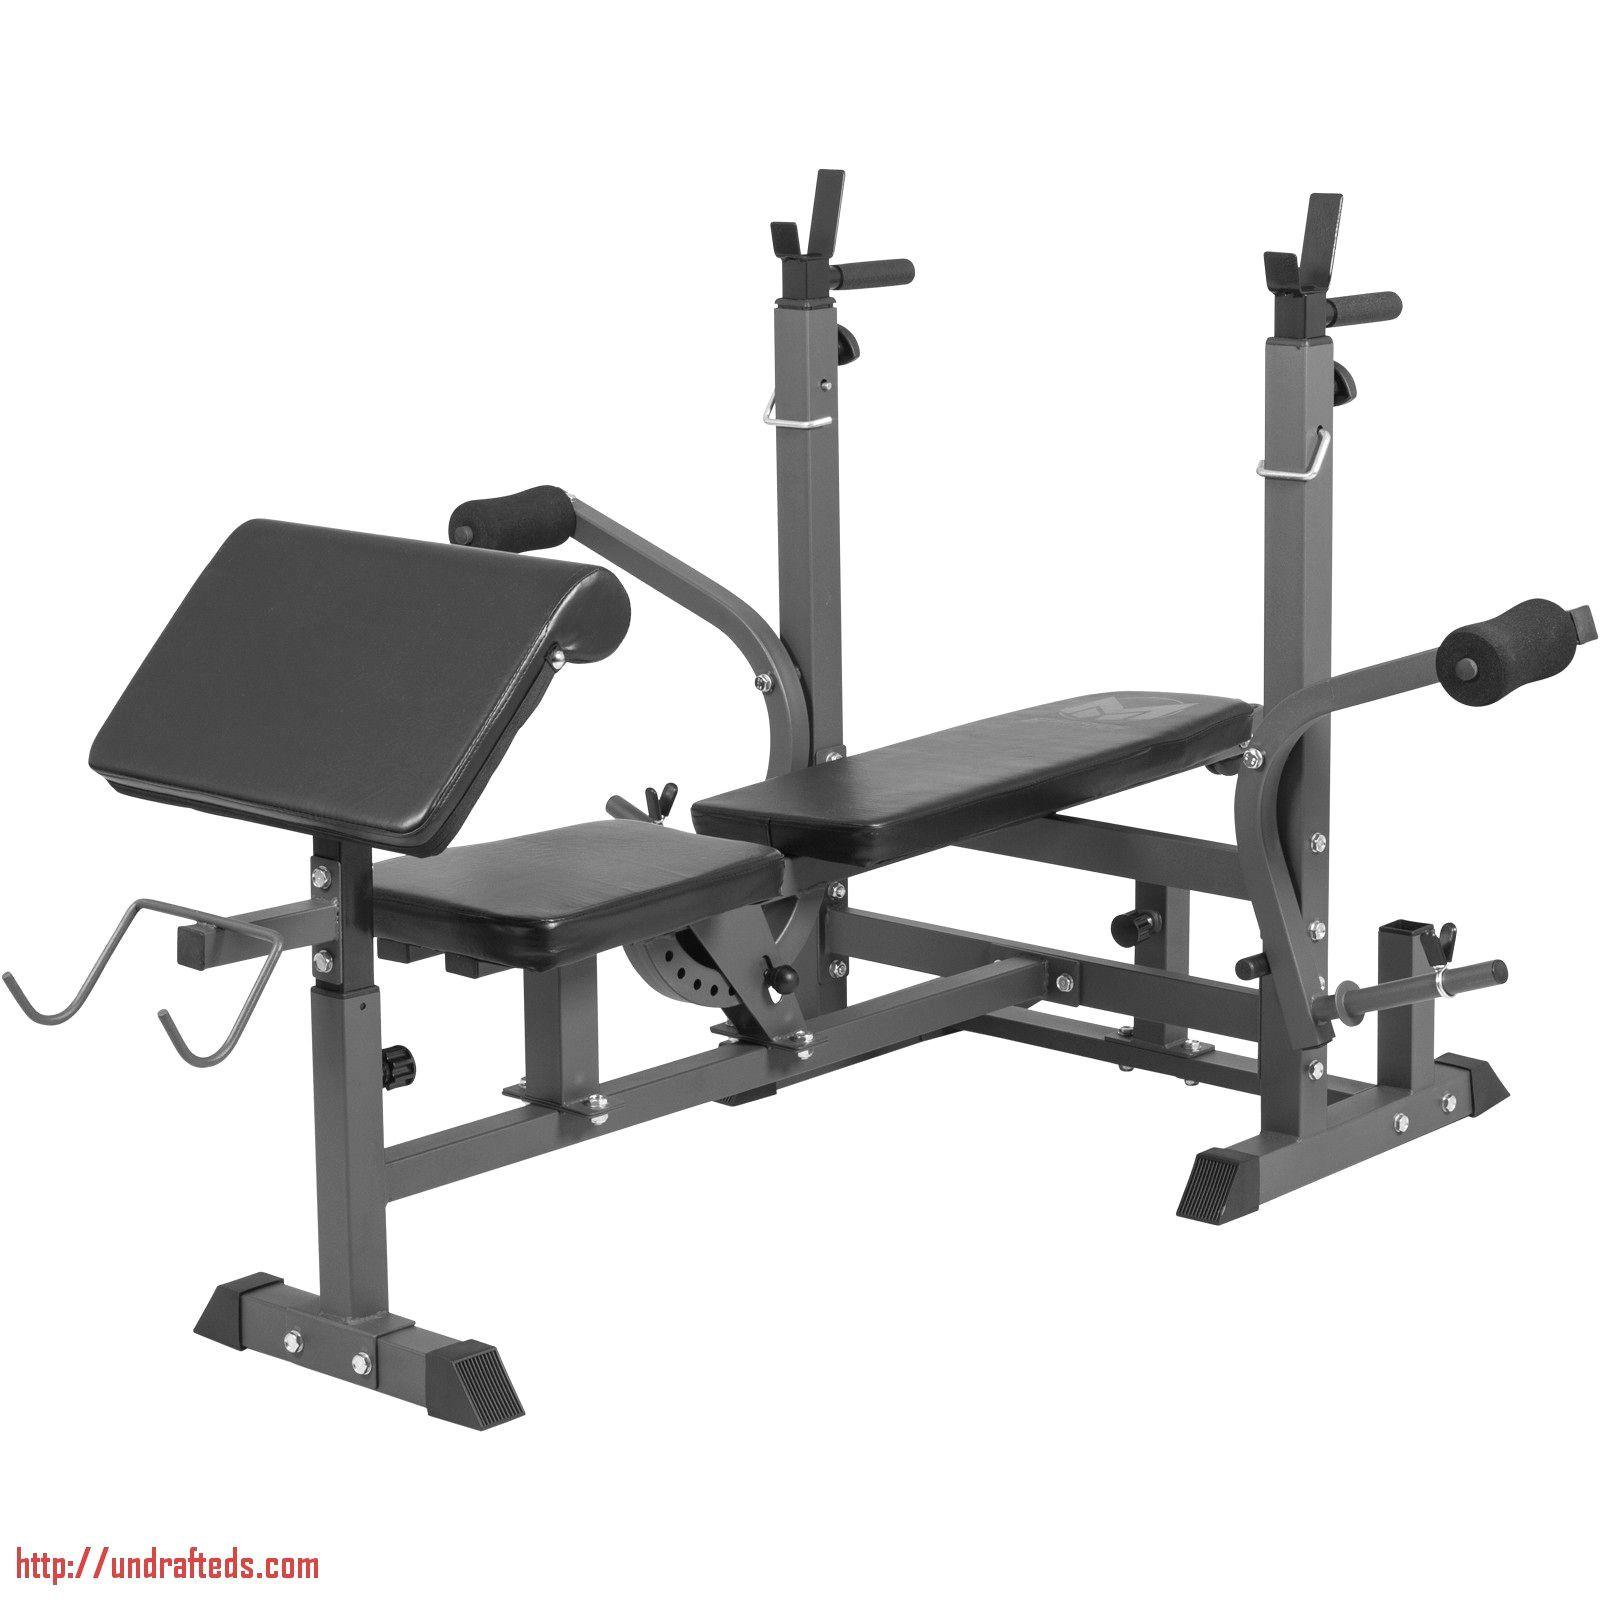 Banc De Musculation Domyos Hg050 Banc De Musculation Domyos Hg050 Domyos Hg050 Banc De Musculation Toutvendre Fr Banc Stationary Bike Stationary Row Machine